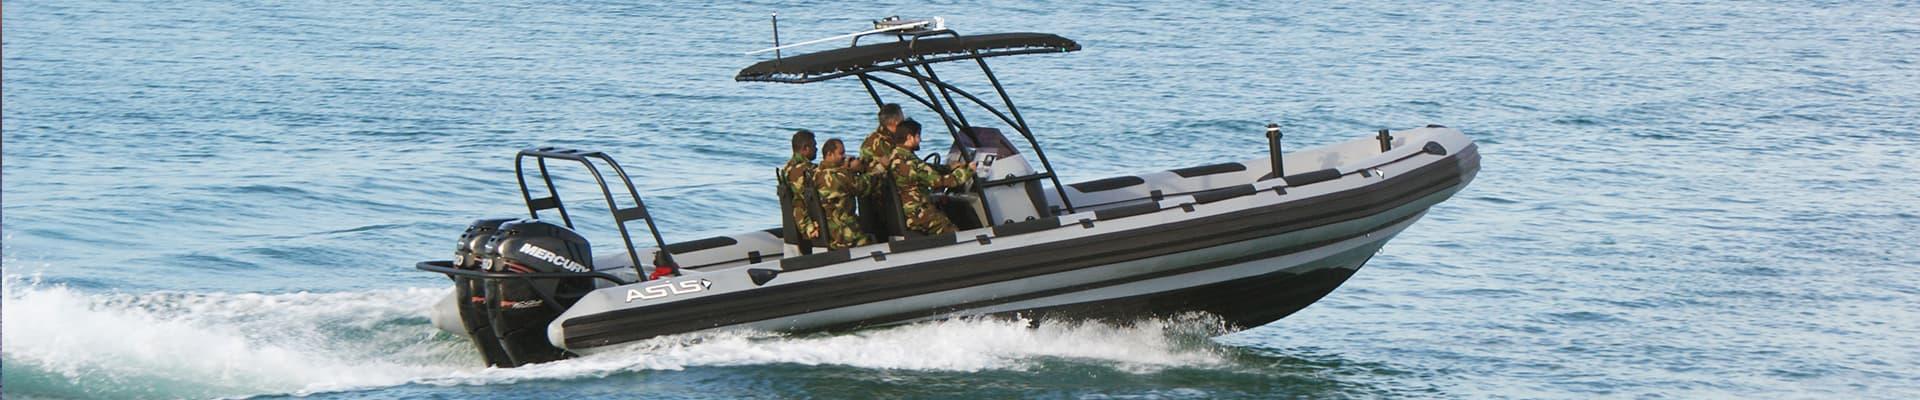 Anti-Piracy-RIB-Boat-9.5m